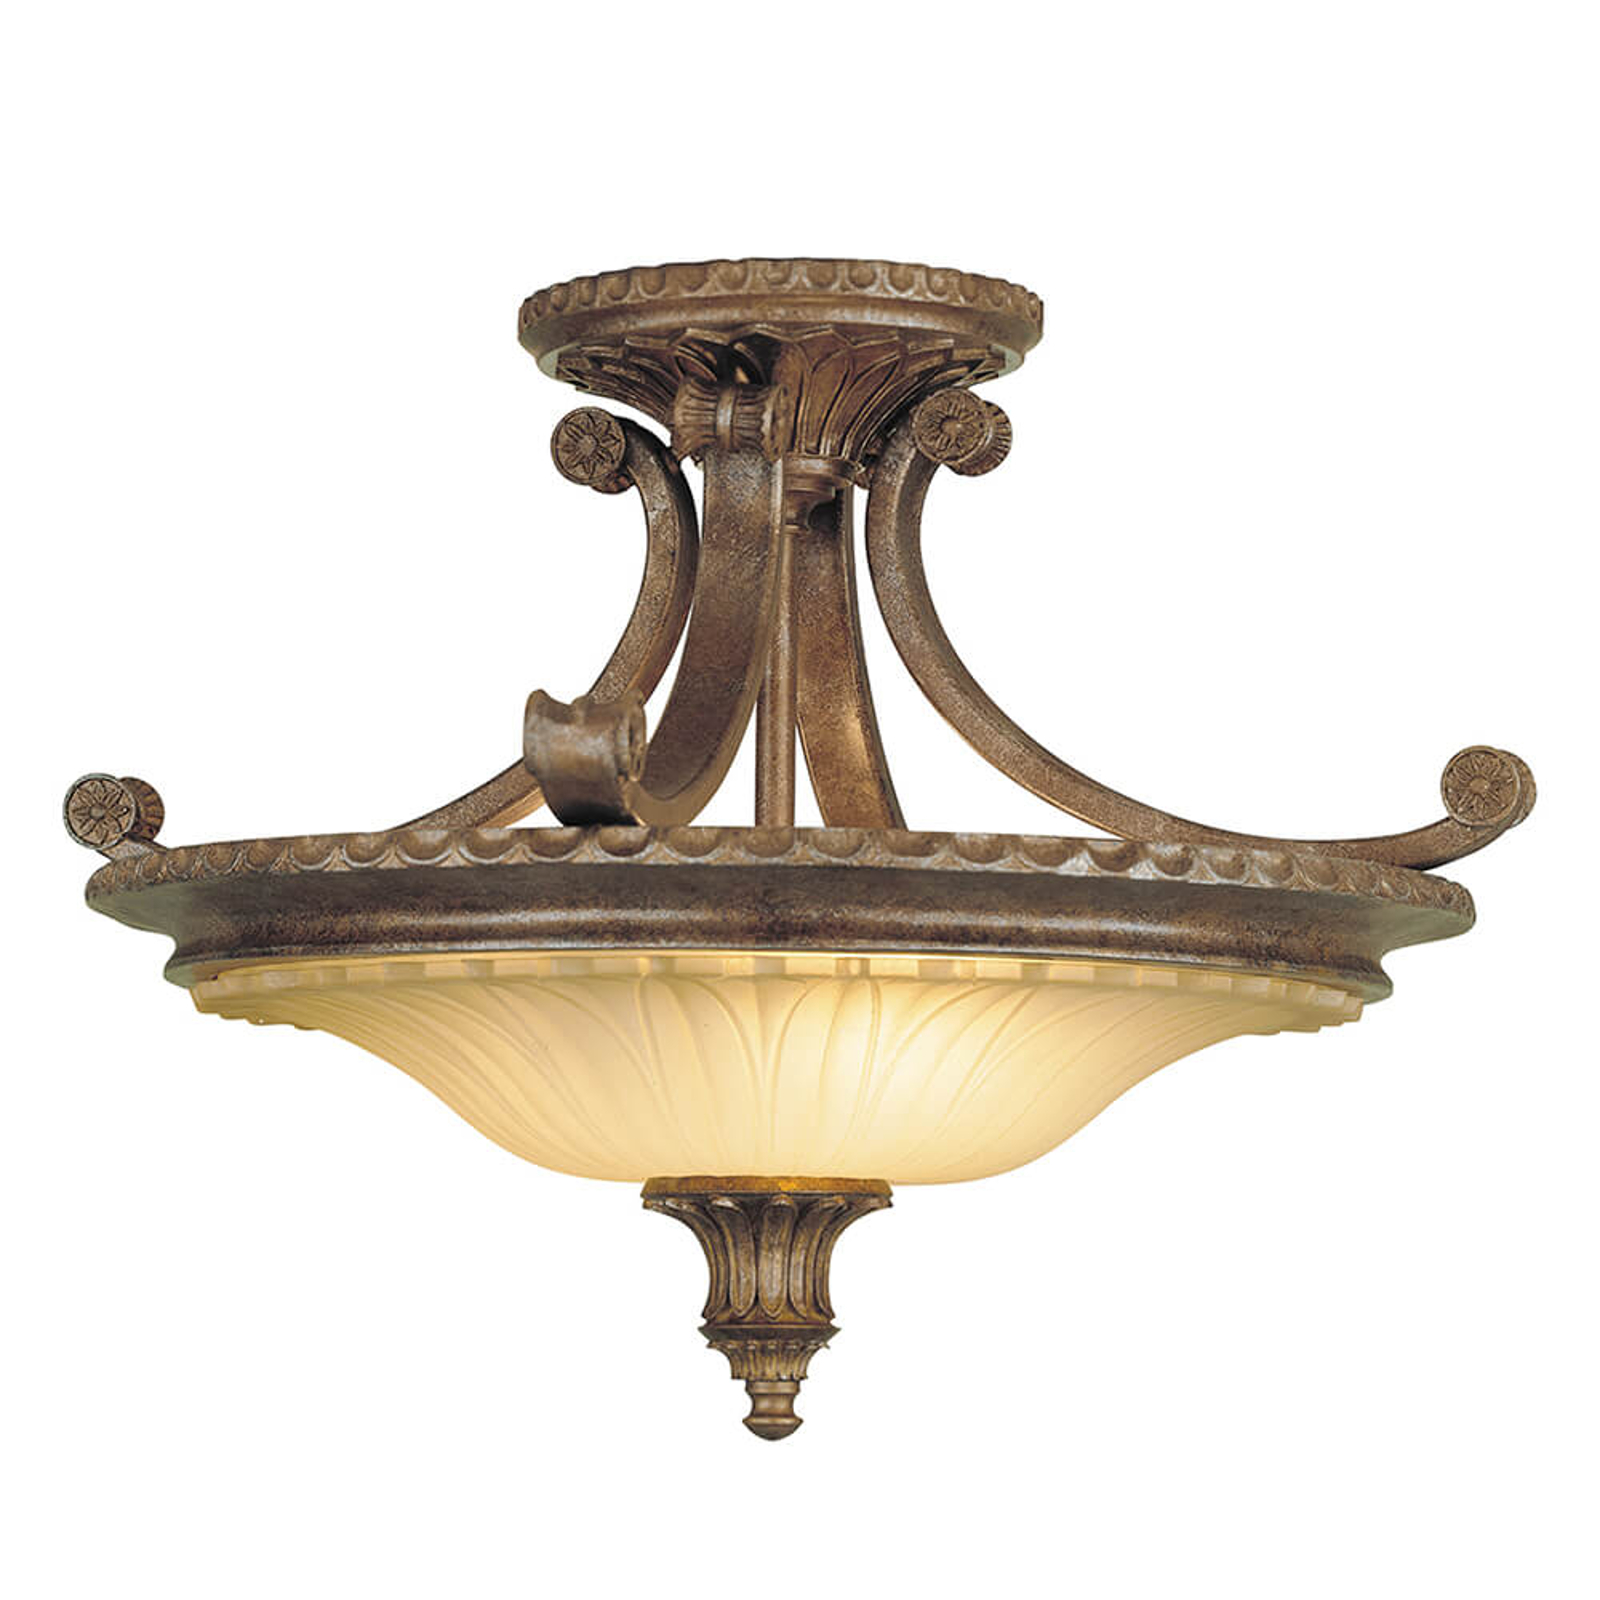 Plafondlamp Stirling Castle in antiek ontwerp